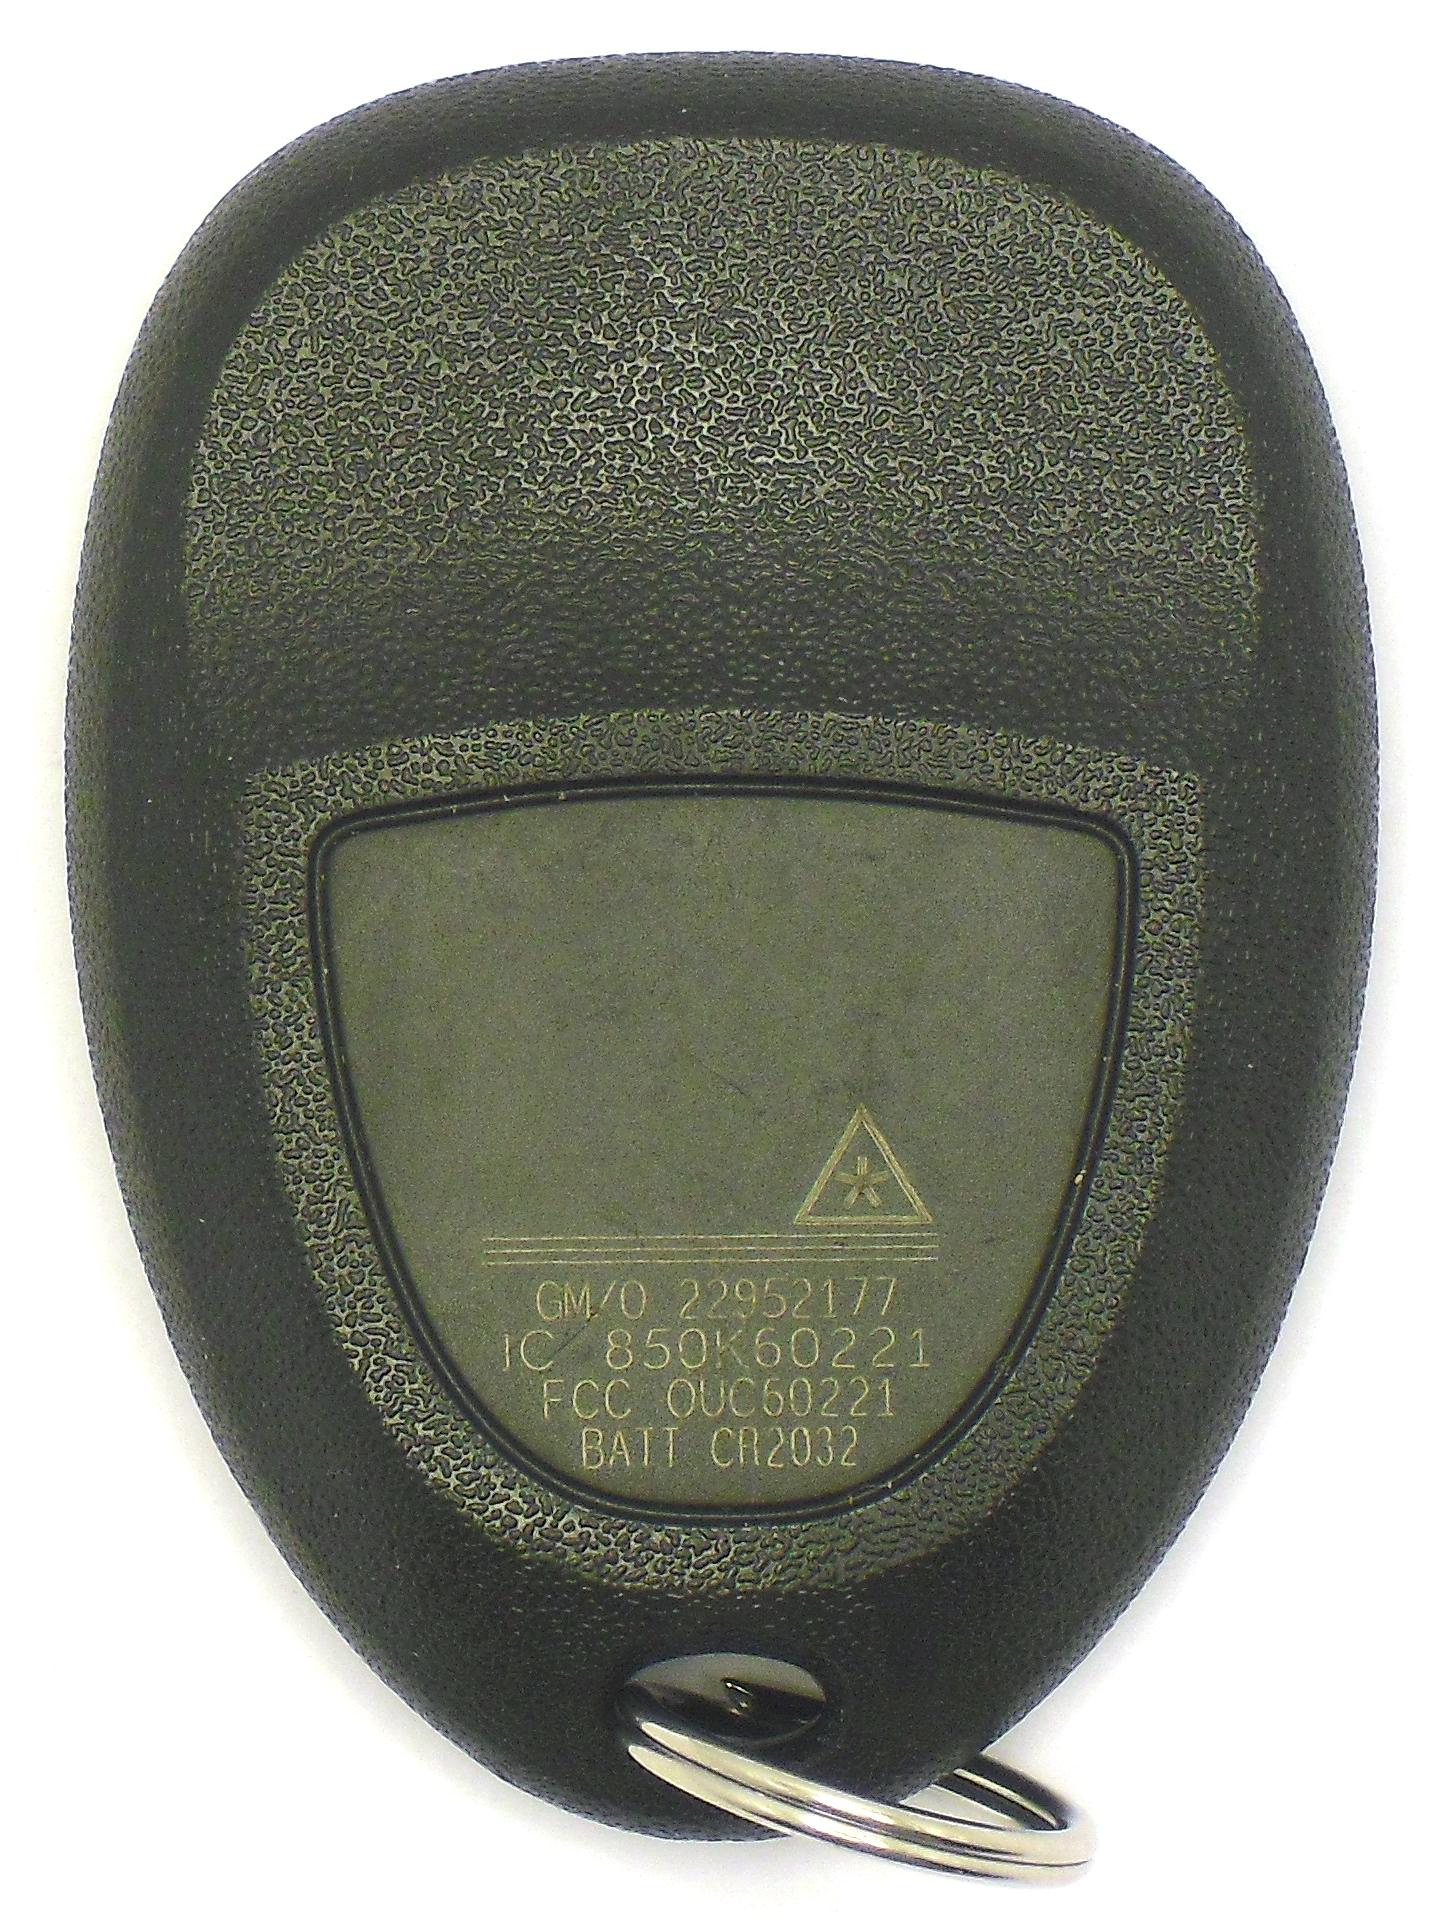 GM Keyless Entry Car Remote - 4 Button w/ Trunk